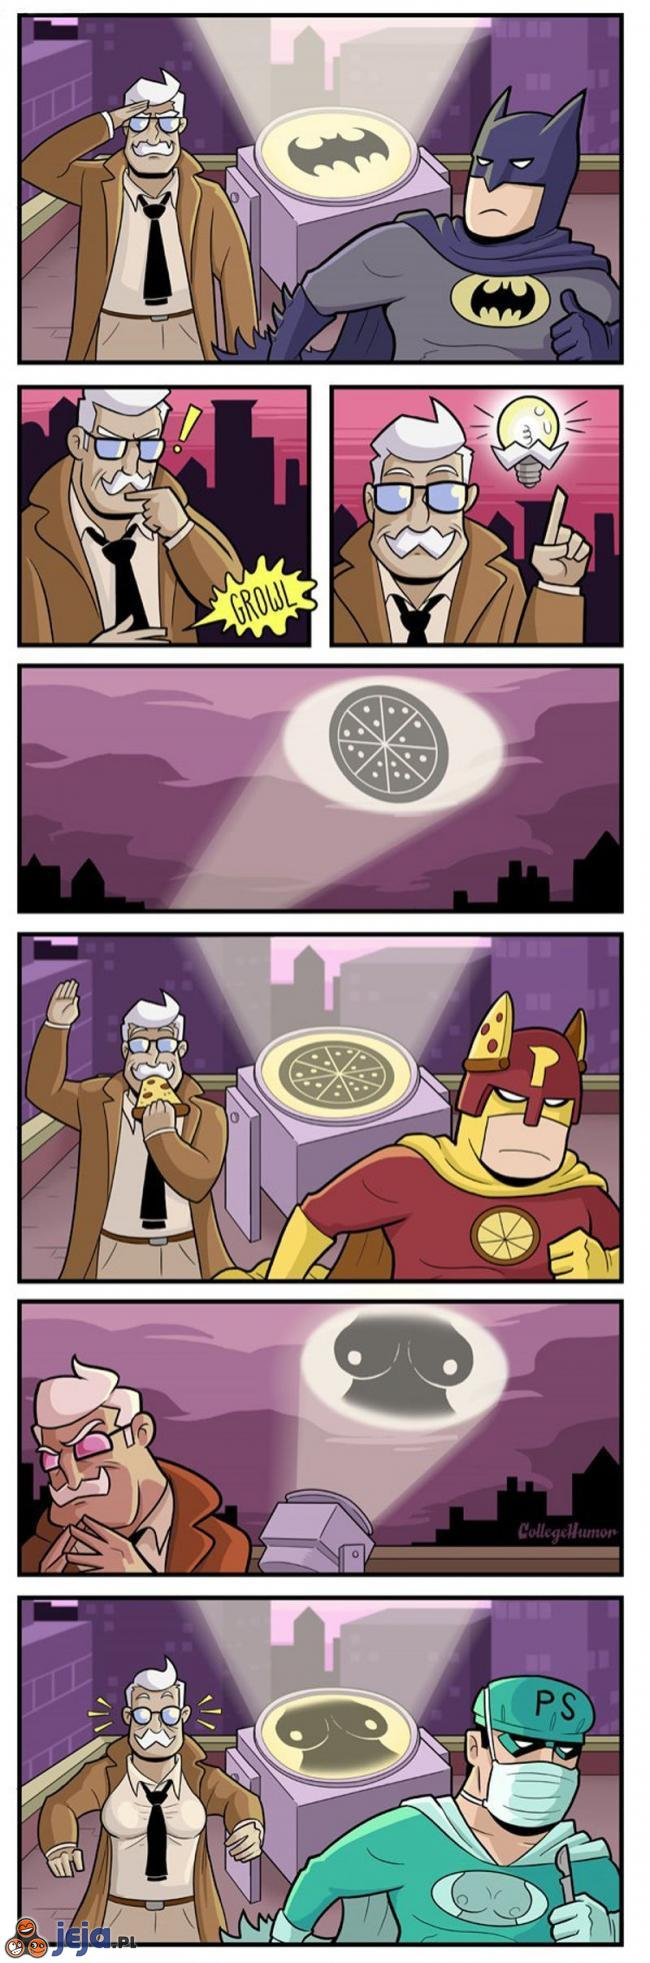 Potrzebna pomoc superbohatera